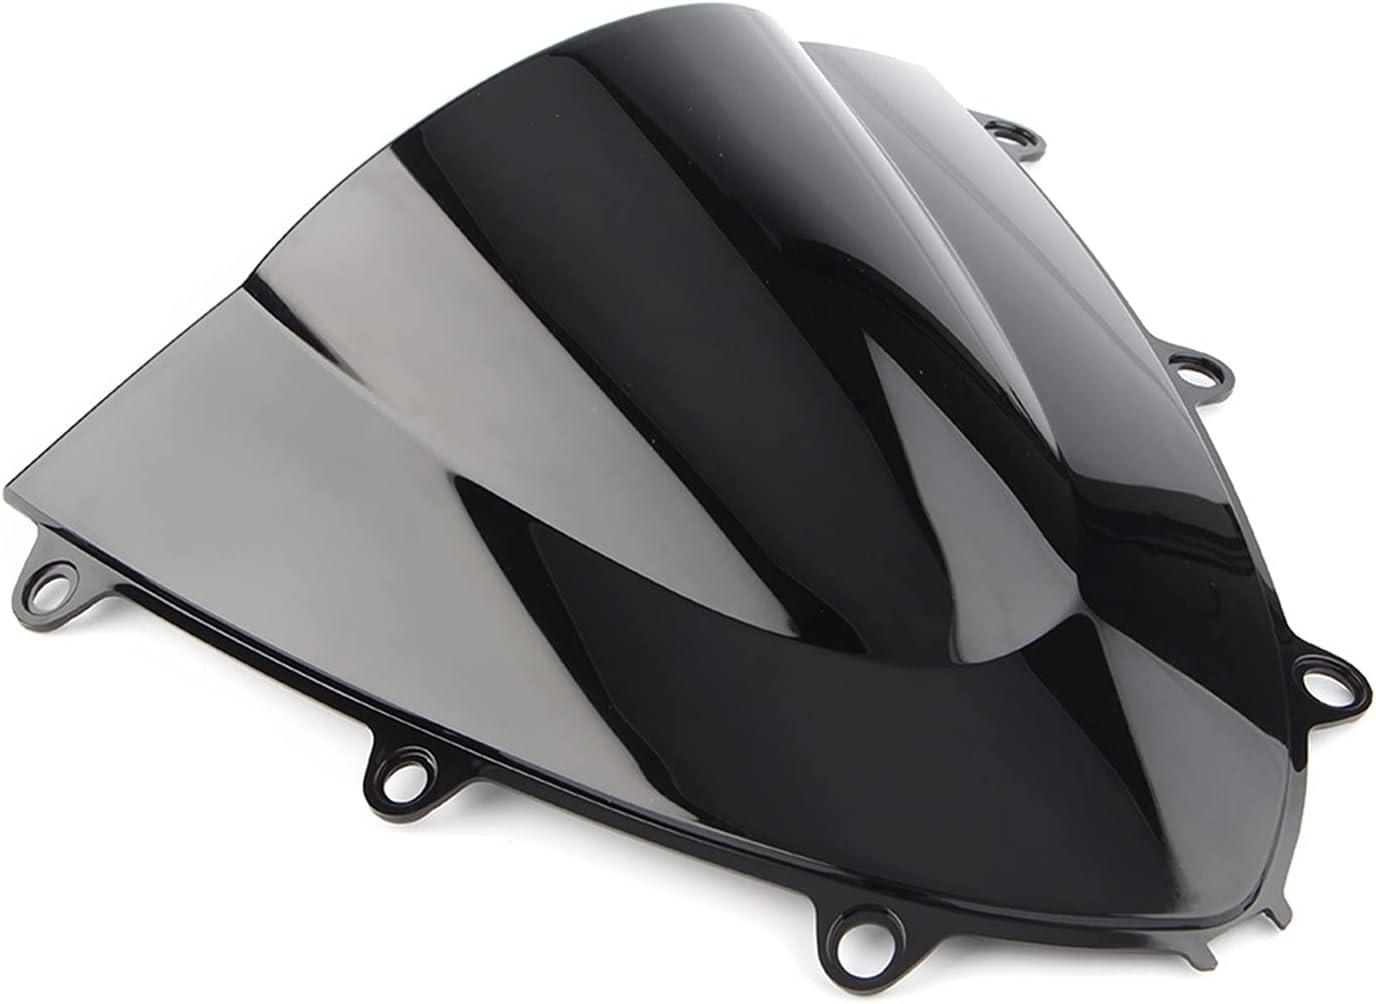 Windshield Austin Mall Finally popular brand Spoiler for CBR1000RR 2008 2011 Motorcycle 2010 2009